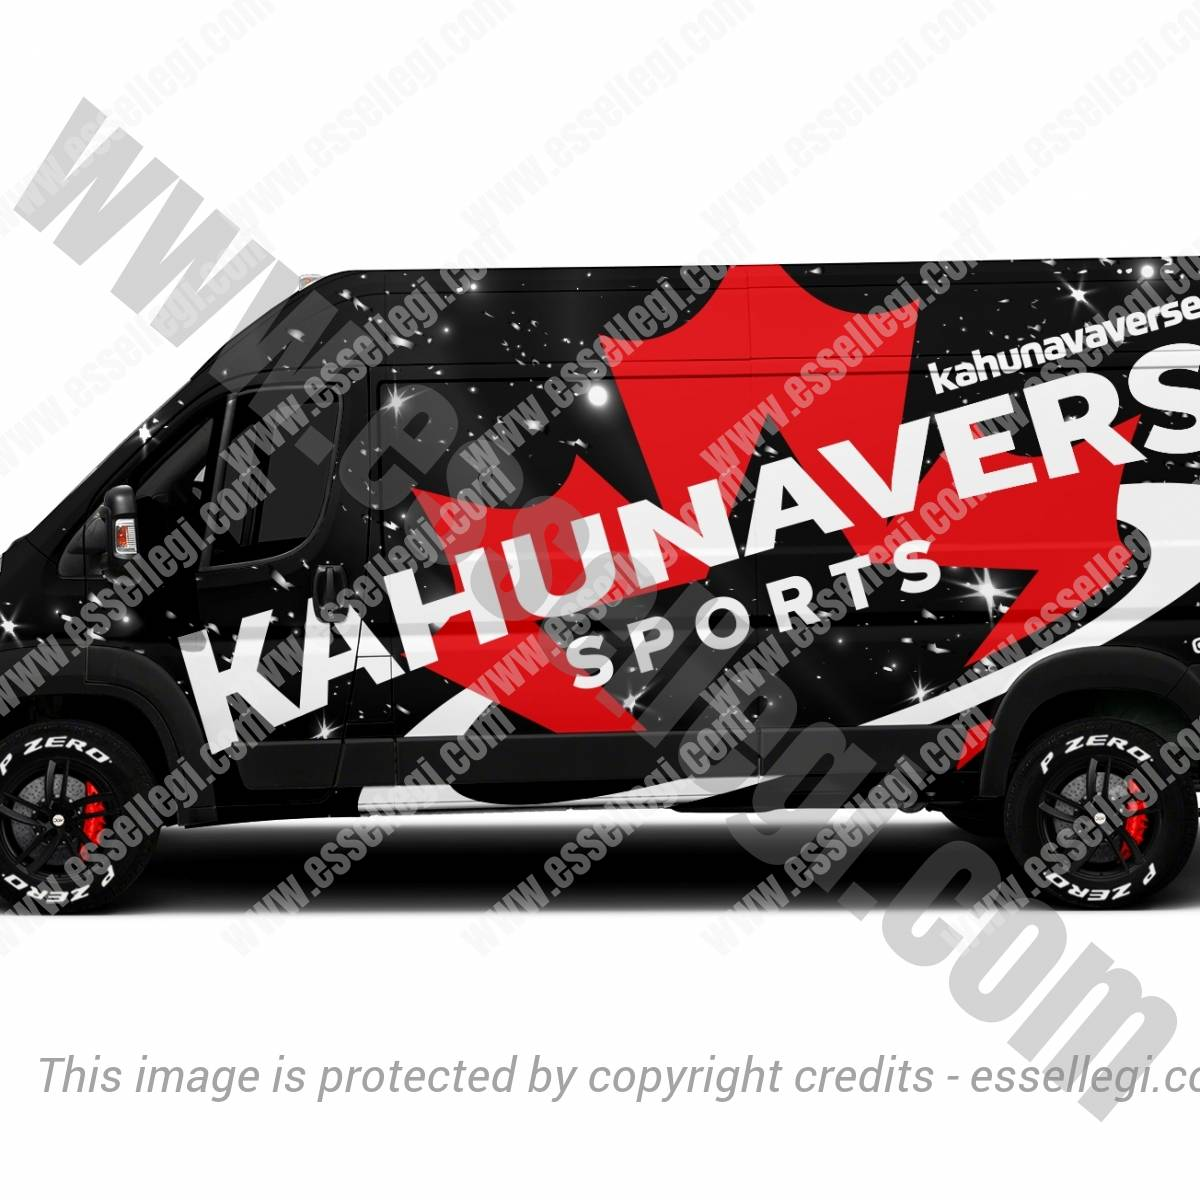 KAHUNAVERSE | VAN WRAP DESIGN 🇨🇦